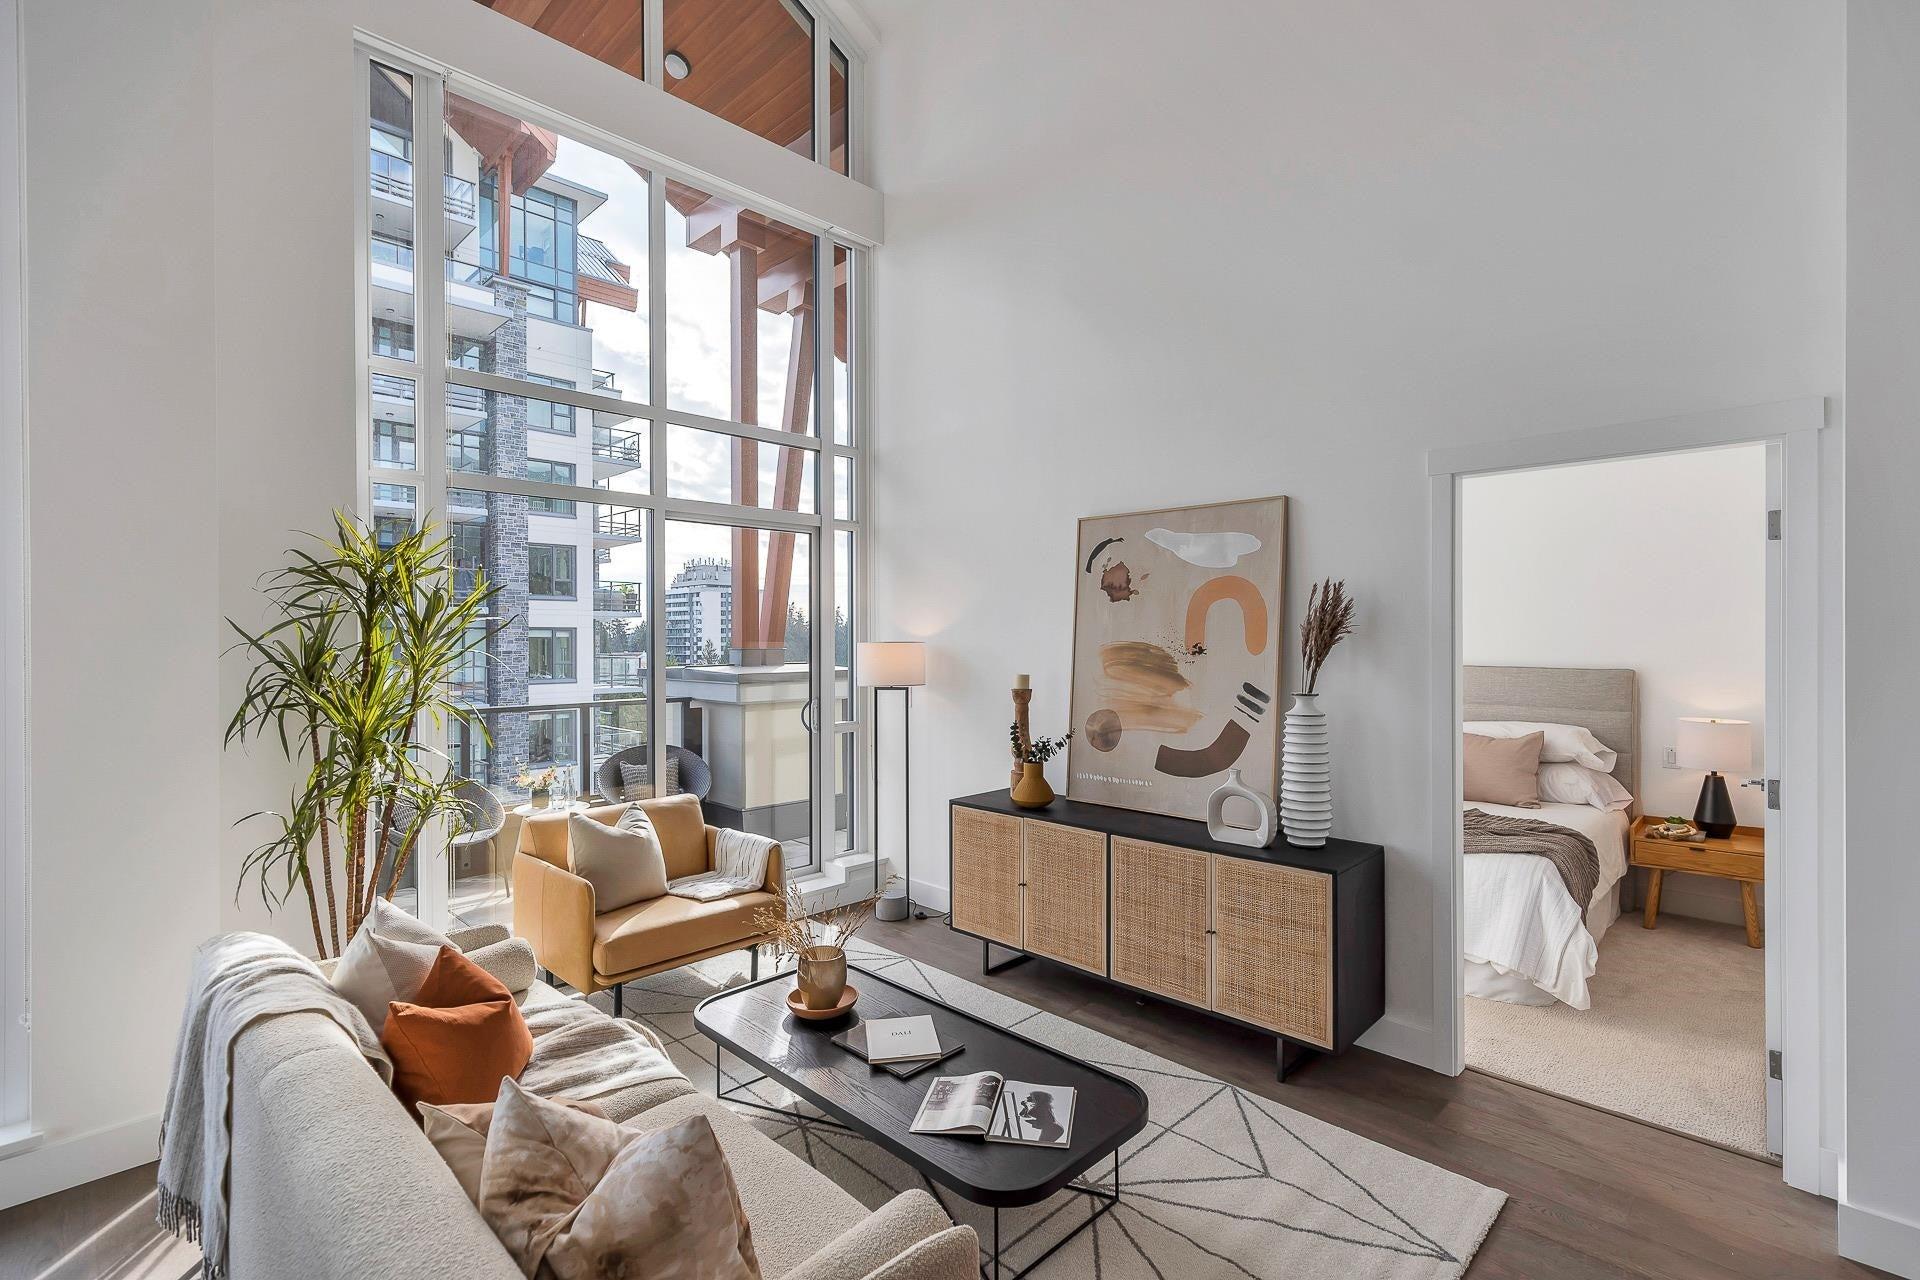 702 2780 VALLEY CENTRE AVENUE - Lynn Valley Apartment/Condo for sale, 3 Bedrooms (R2622279) - #5